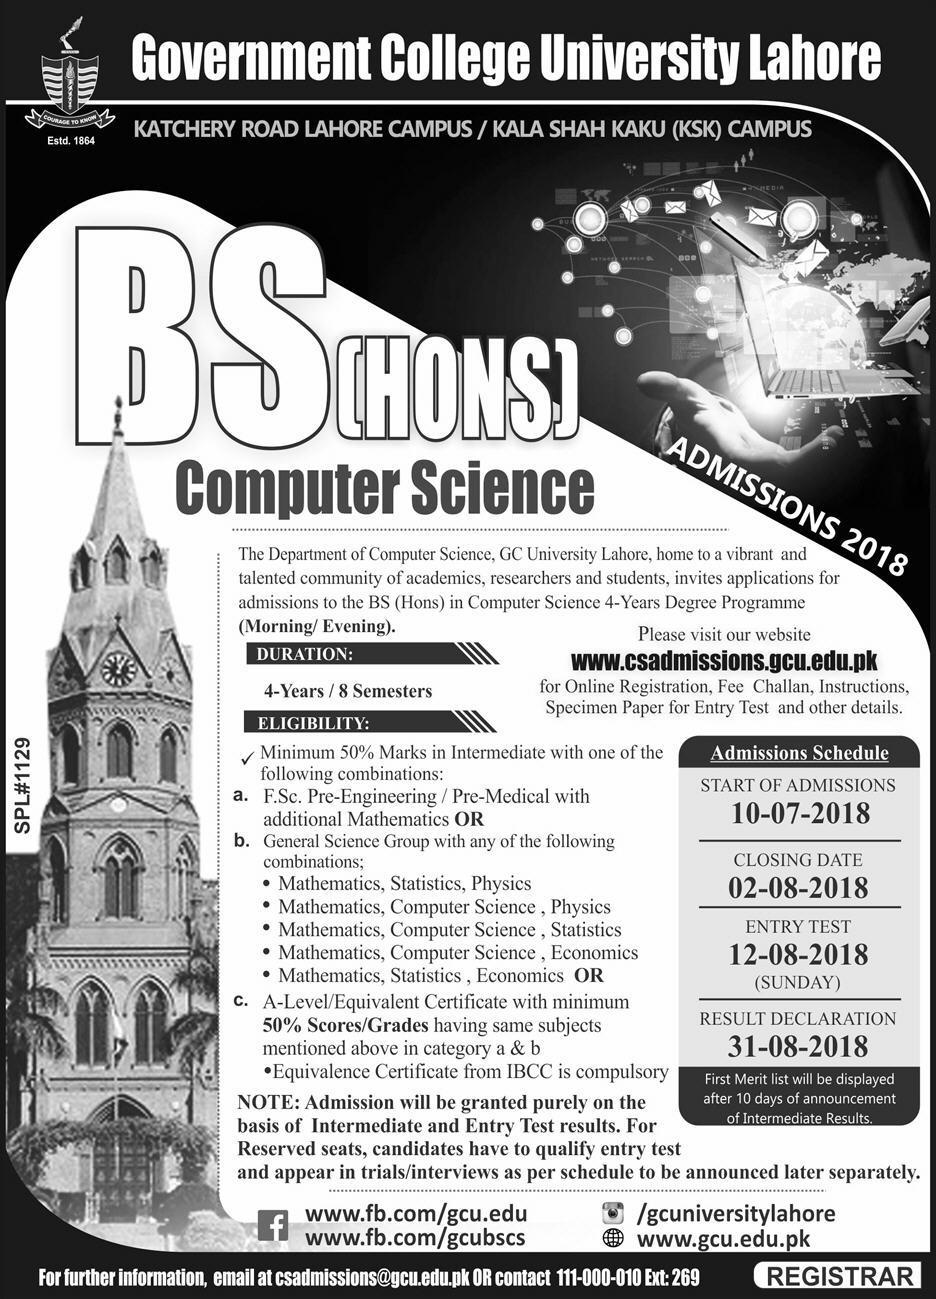 GCU Admission 2018 August Ad